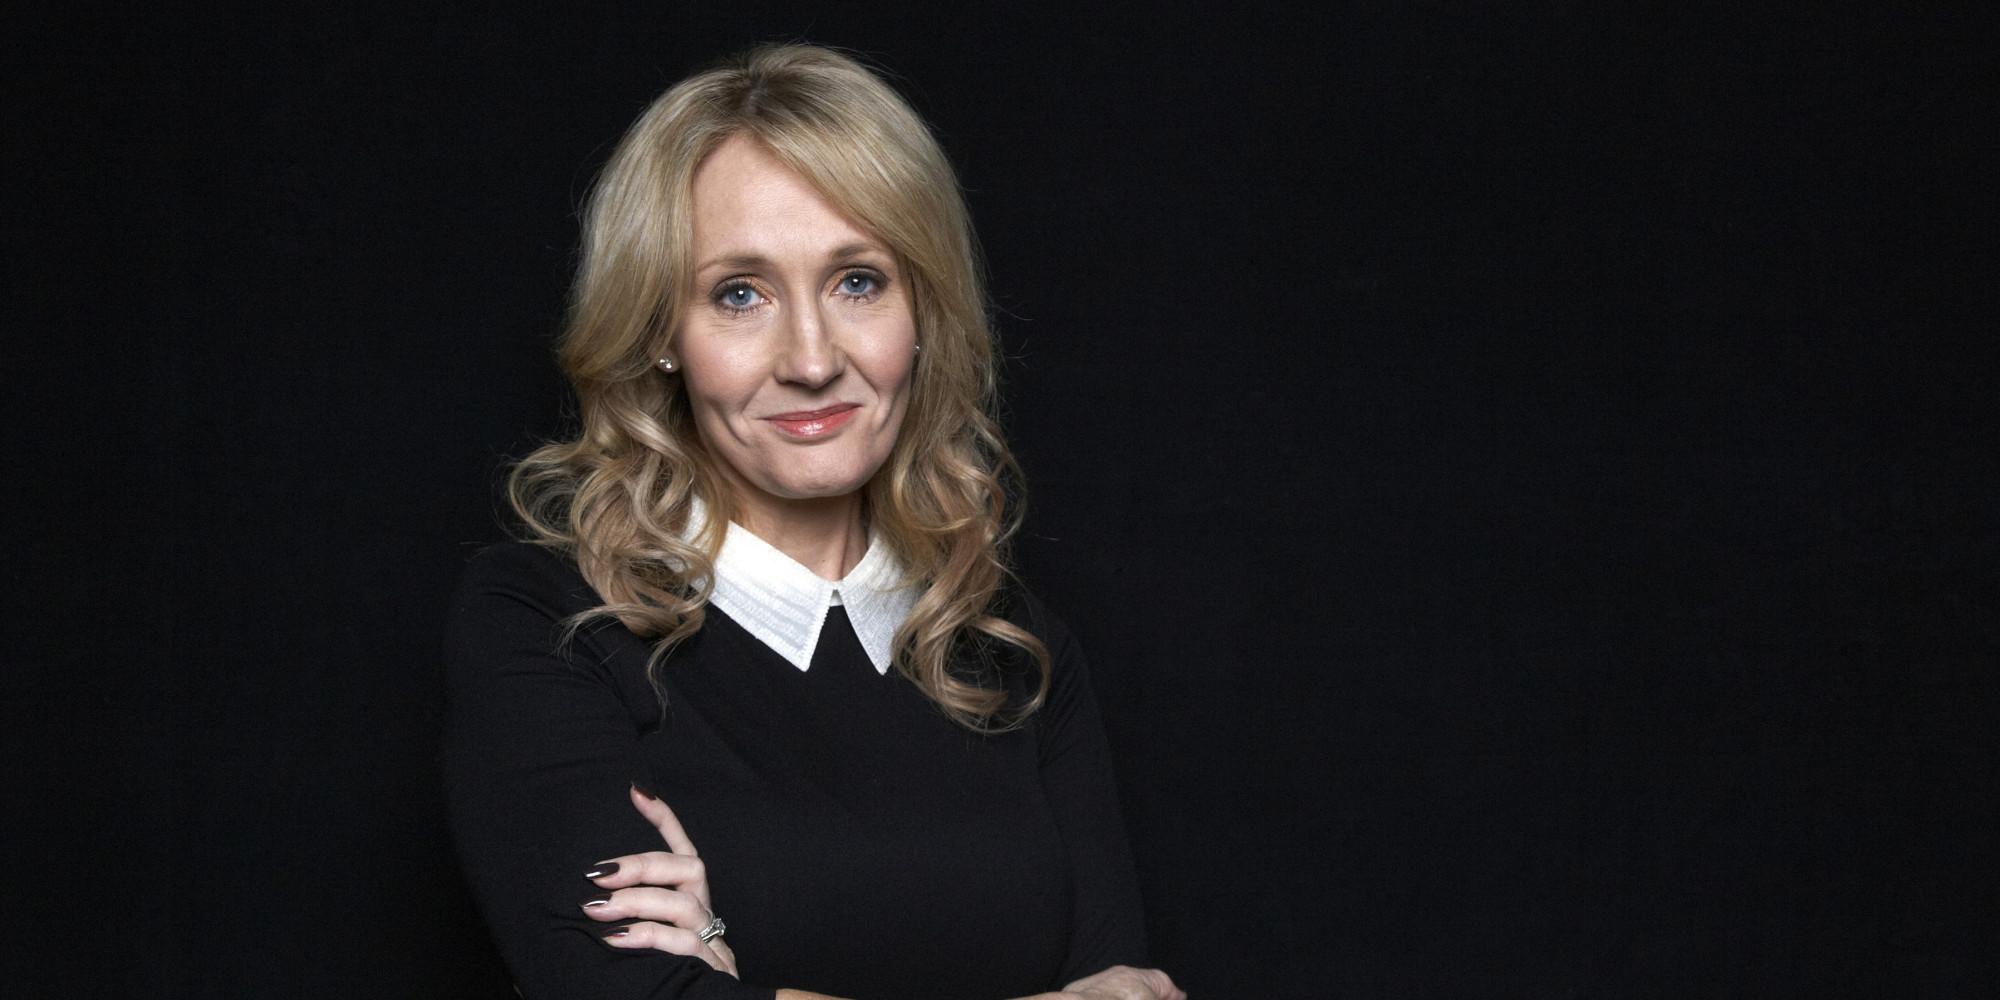 Jk Rowling, Hay una lesbiana en mi sopa